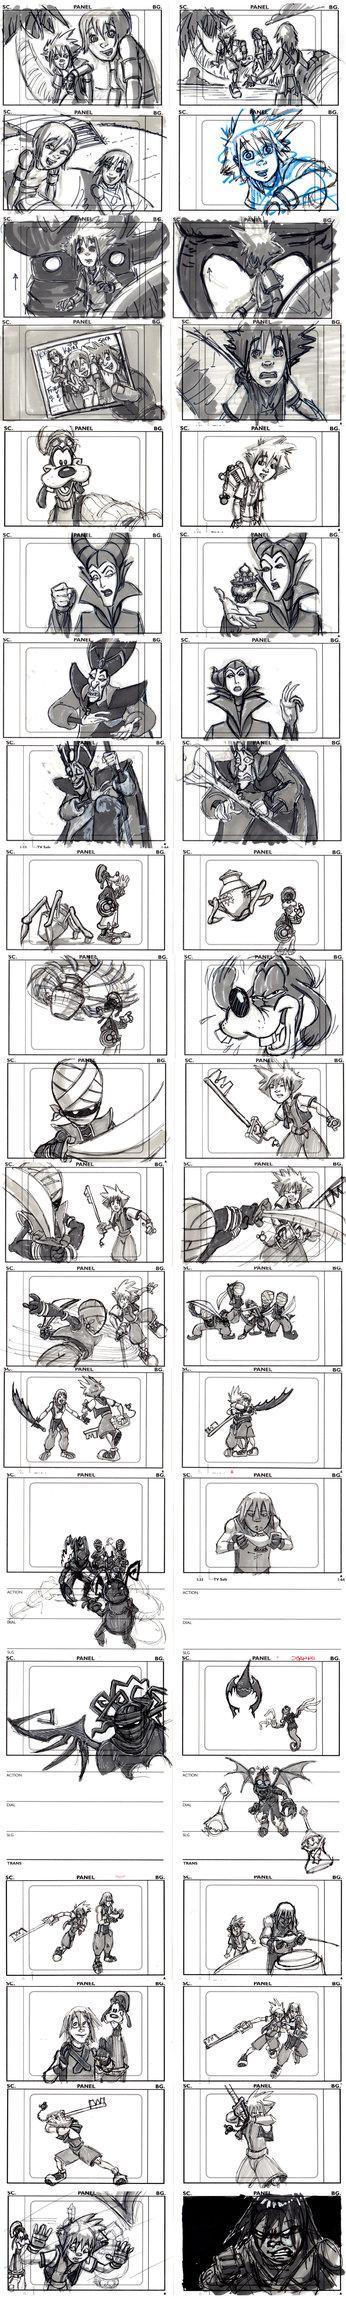 Kingdom_Hearts_storyboard_von_sethkearsley